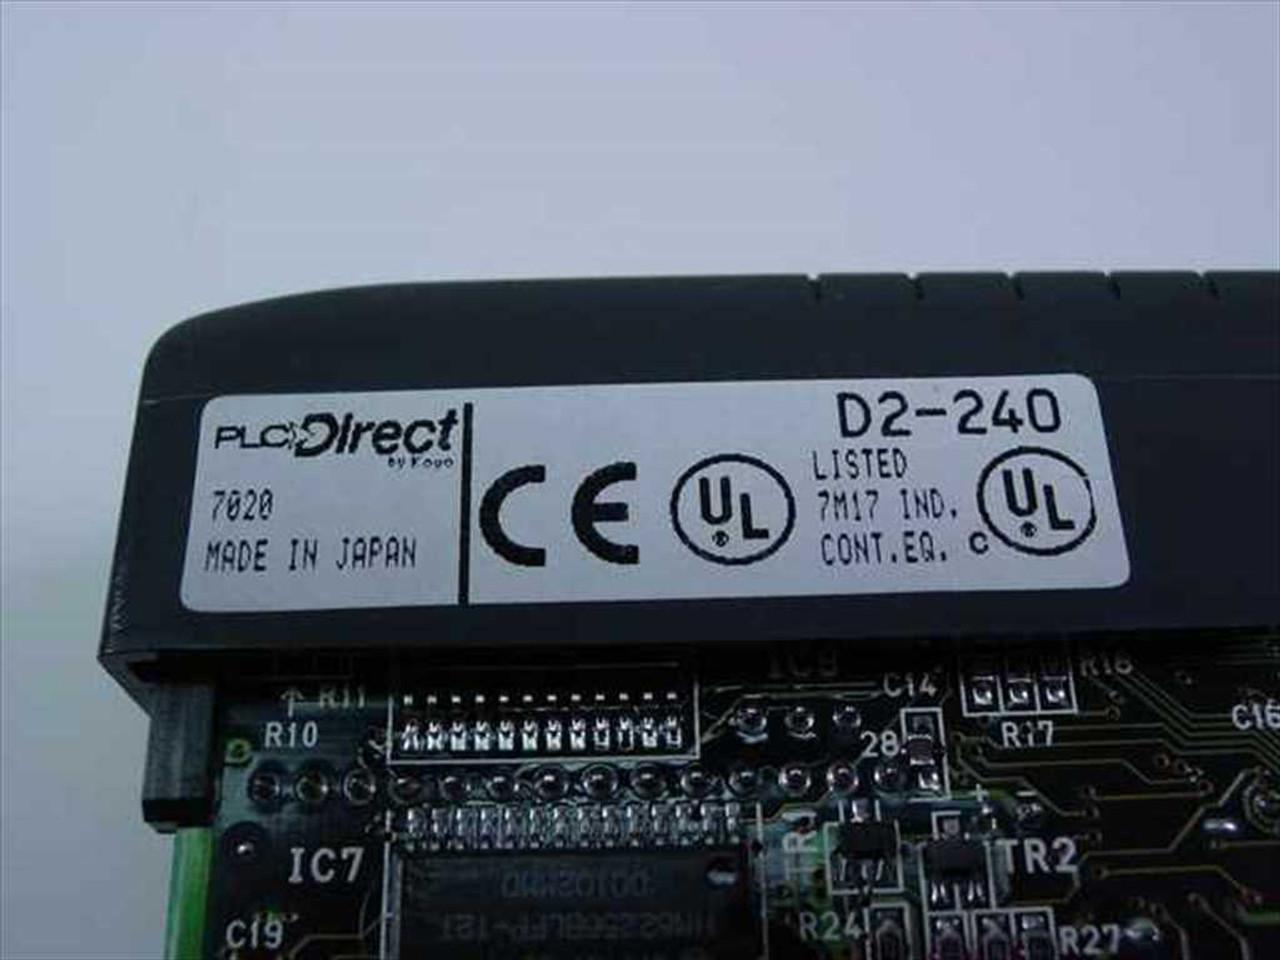 Koyo D2-240 Direct Logic 205 Module - New in Box